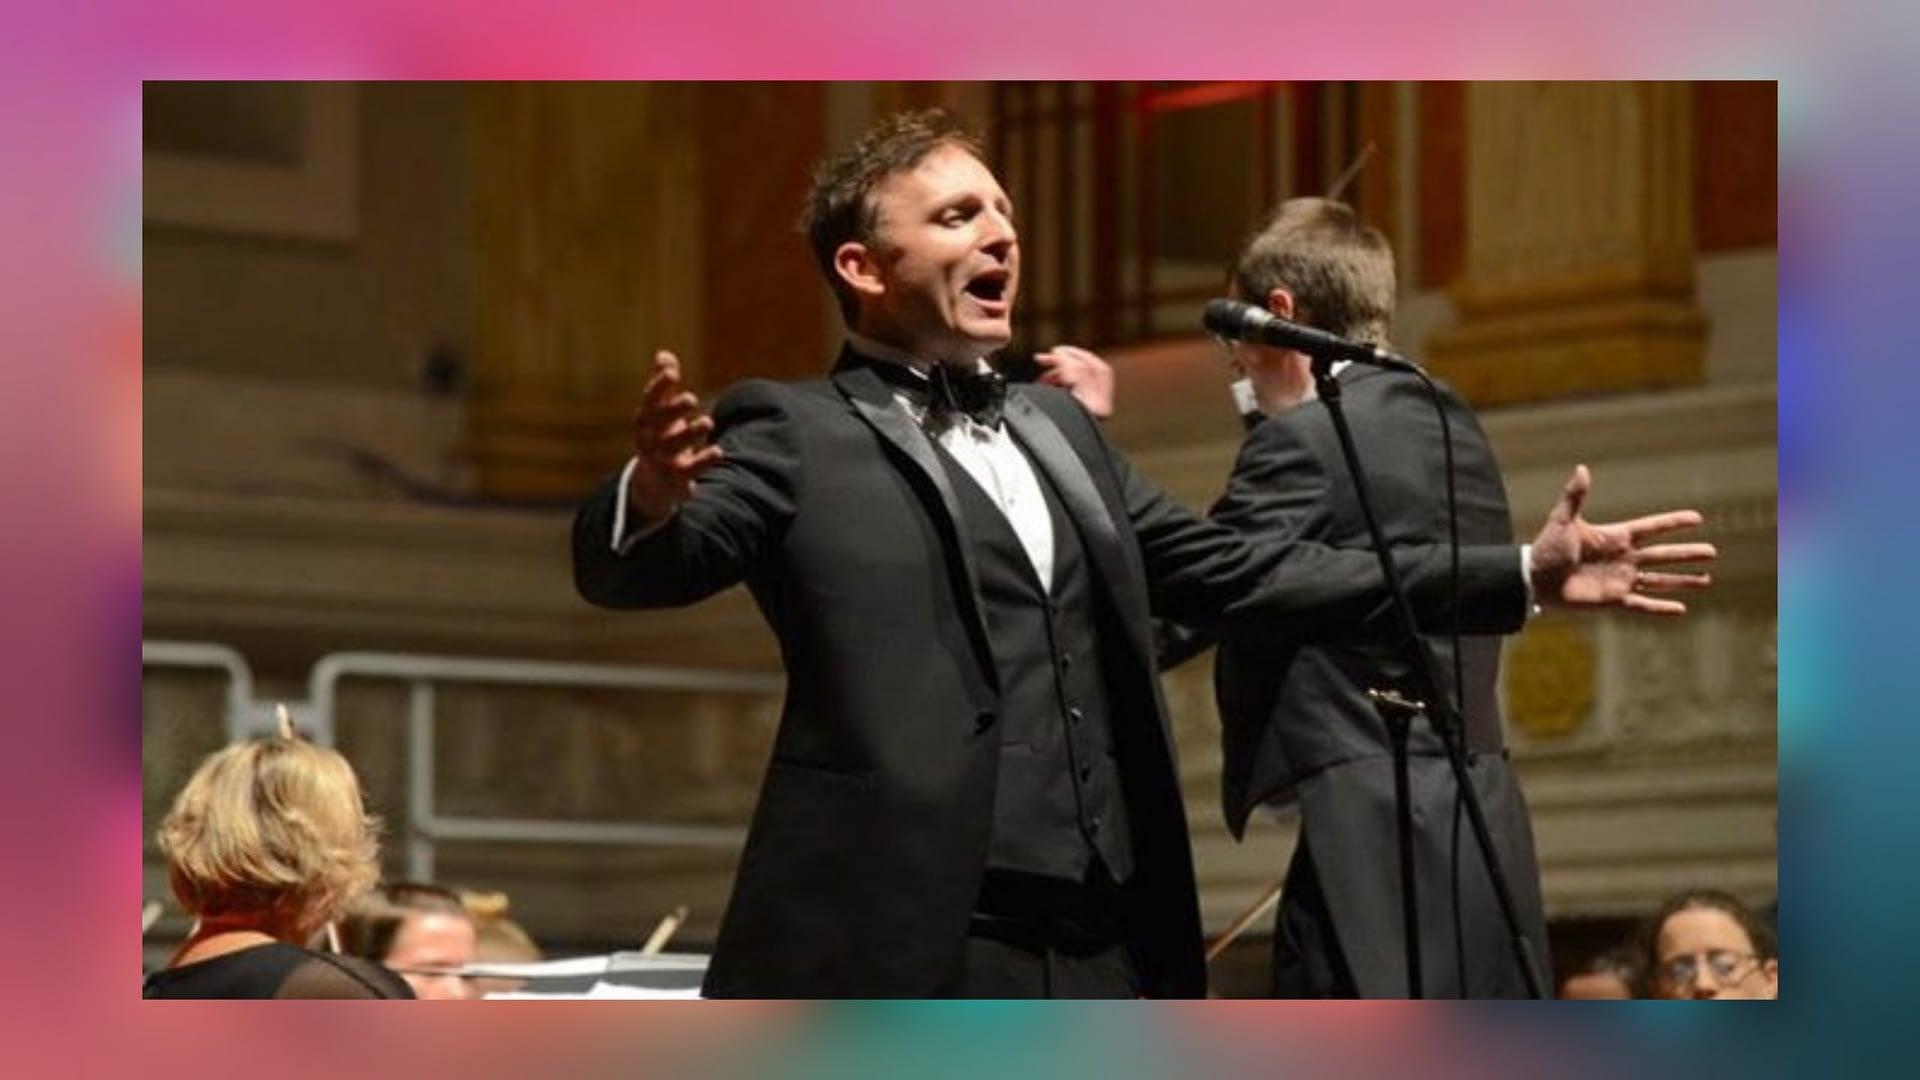 Tenor opera singer ireland